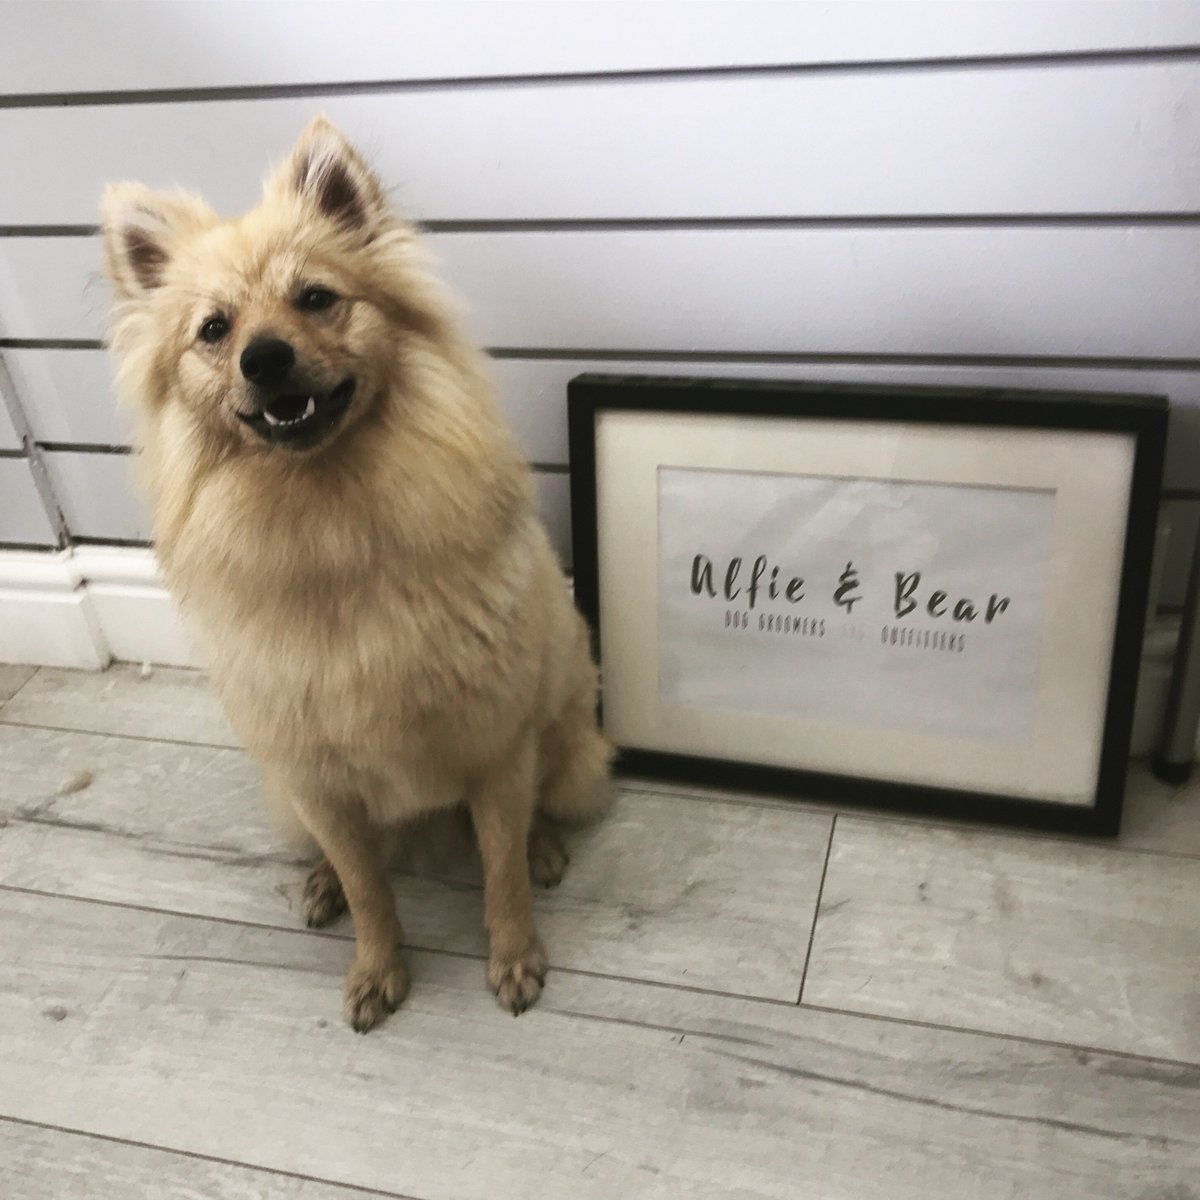 Meet Super Cute Newbie Pumpkin  He Was A Superstar    #DogGrooming #DogGroomer #Pomeranian #Dogs #DogSpa #DogGroomingSalon #DogOfTheDay #DogsOfTwitter #DogLovers #NEFollowers #NewcastleUponTyne<br>http://pic.twitter.com/29Ajo80wrB